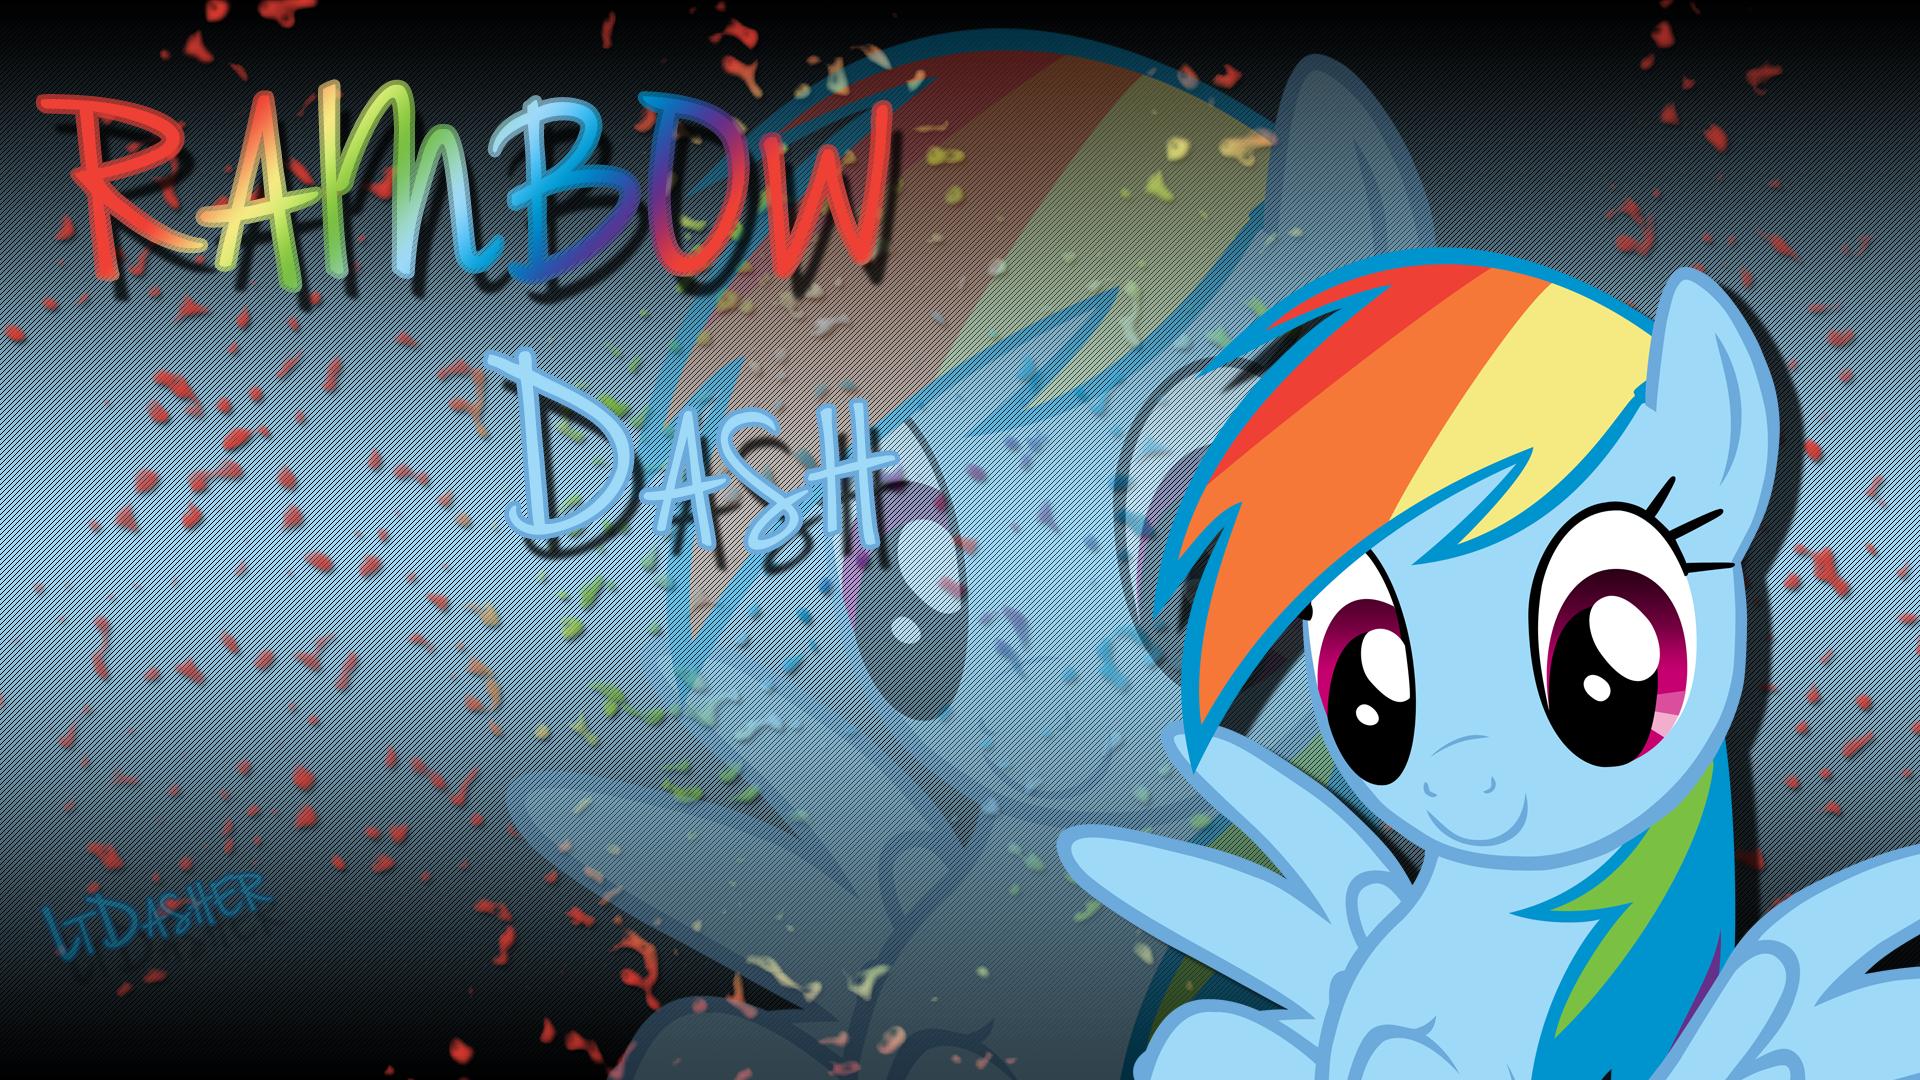 rainbow dash sphere background - photo #22